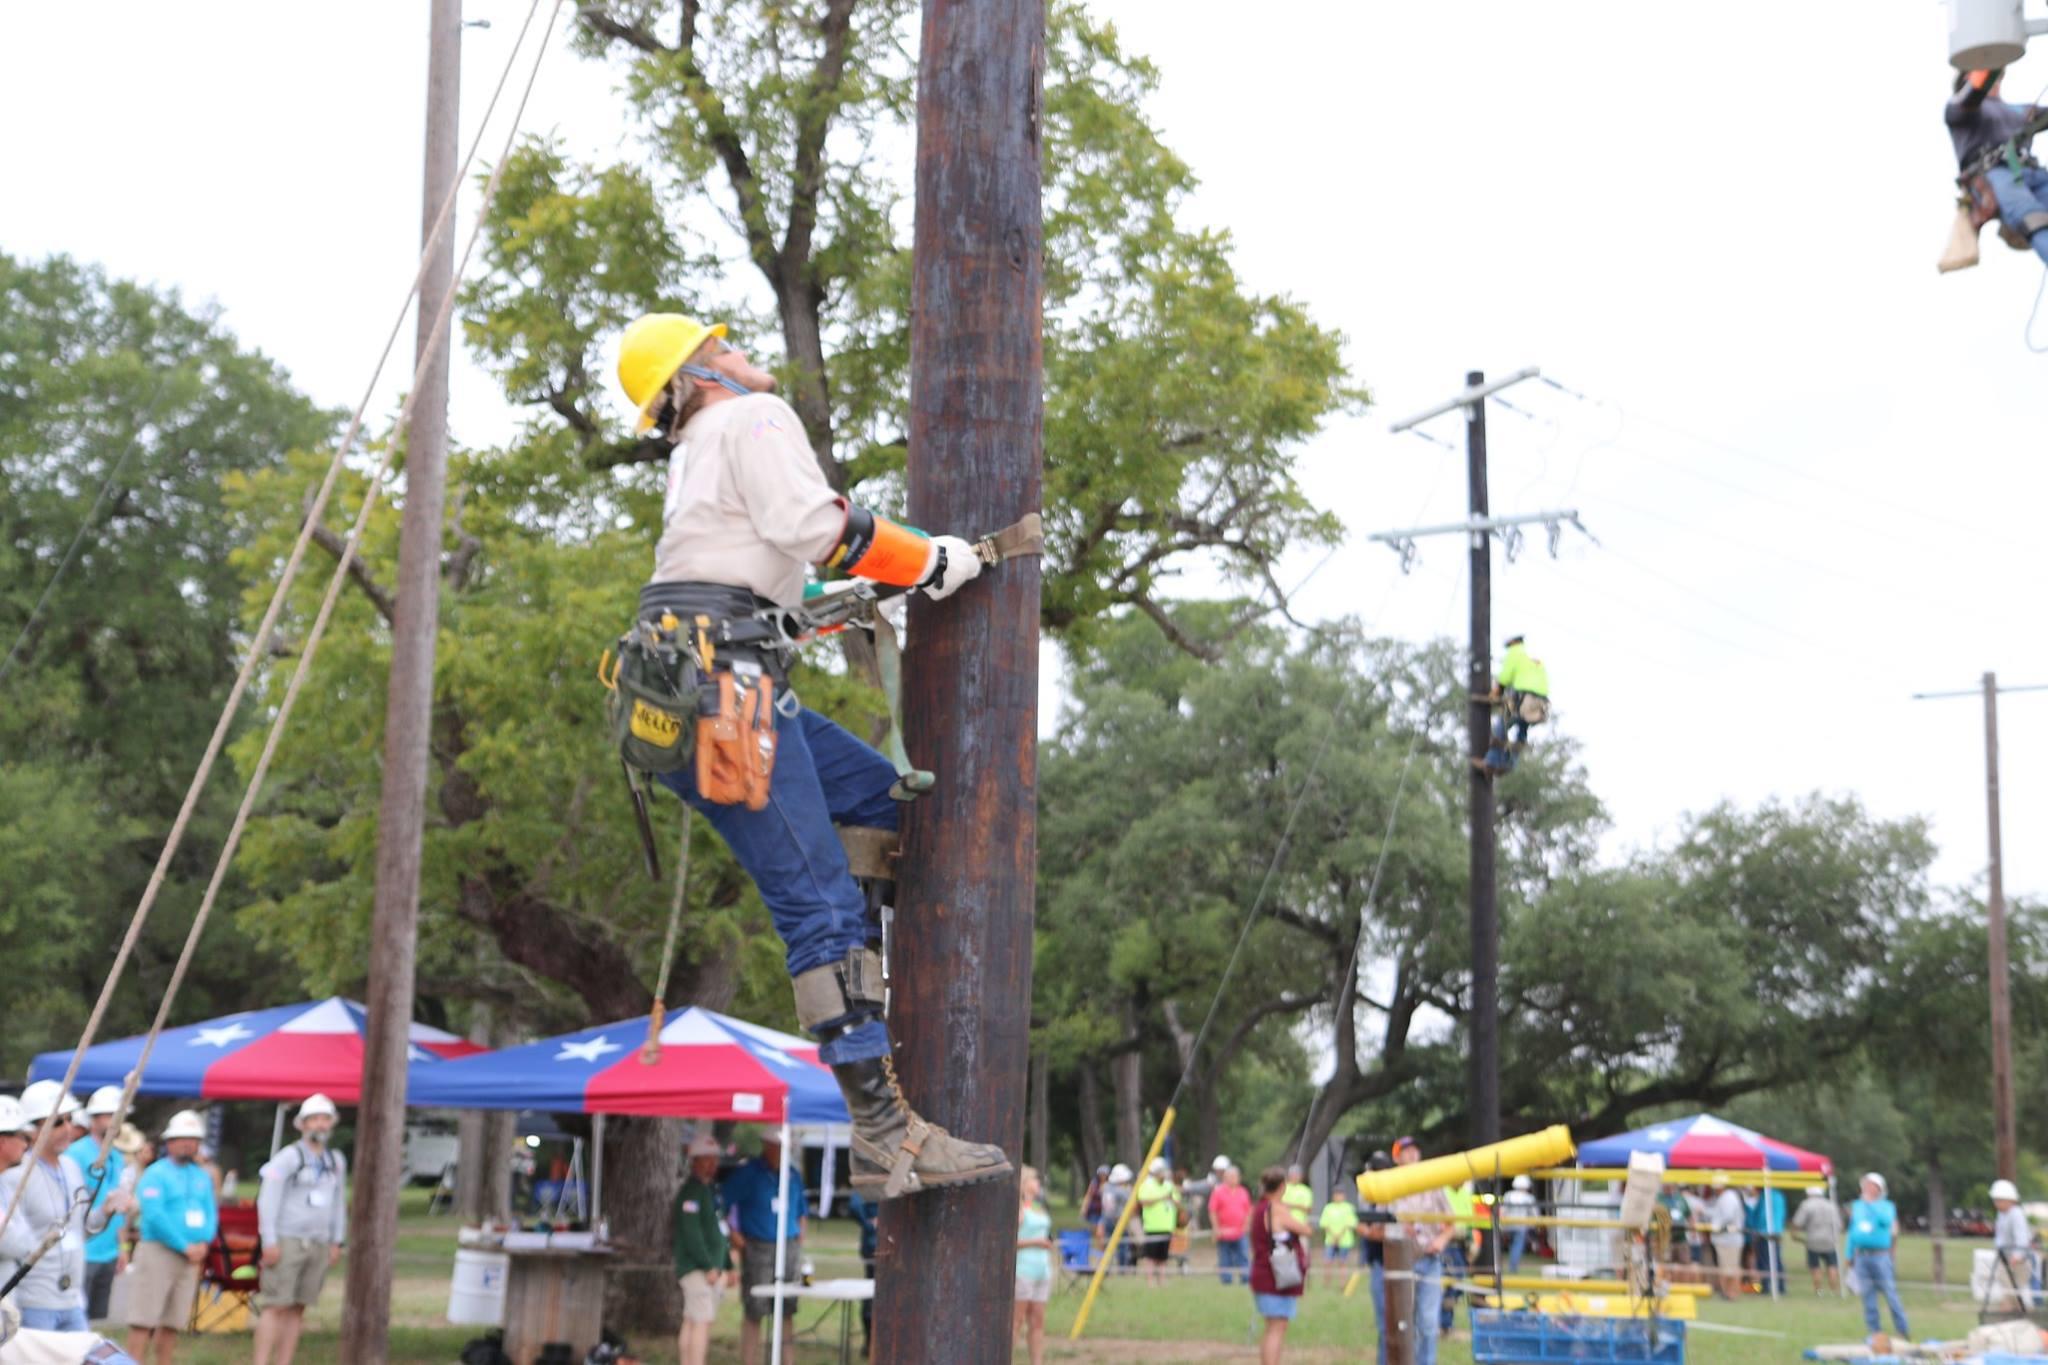 Apprentice lineman pole climb